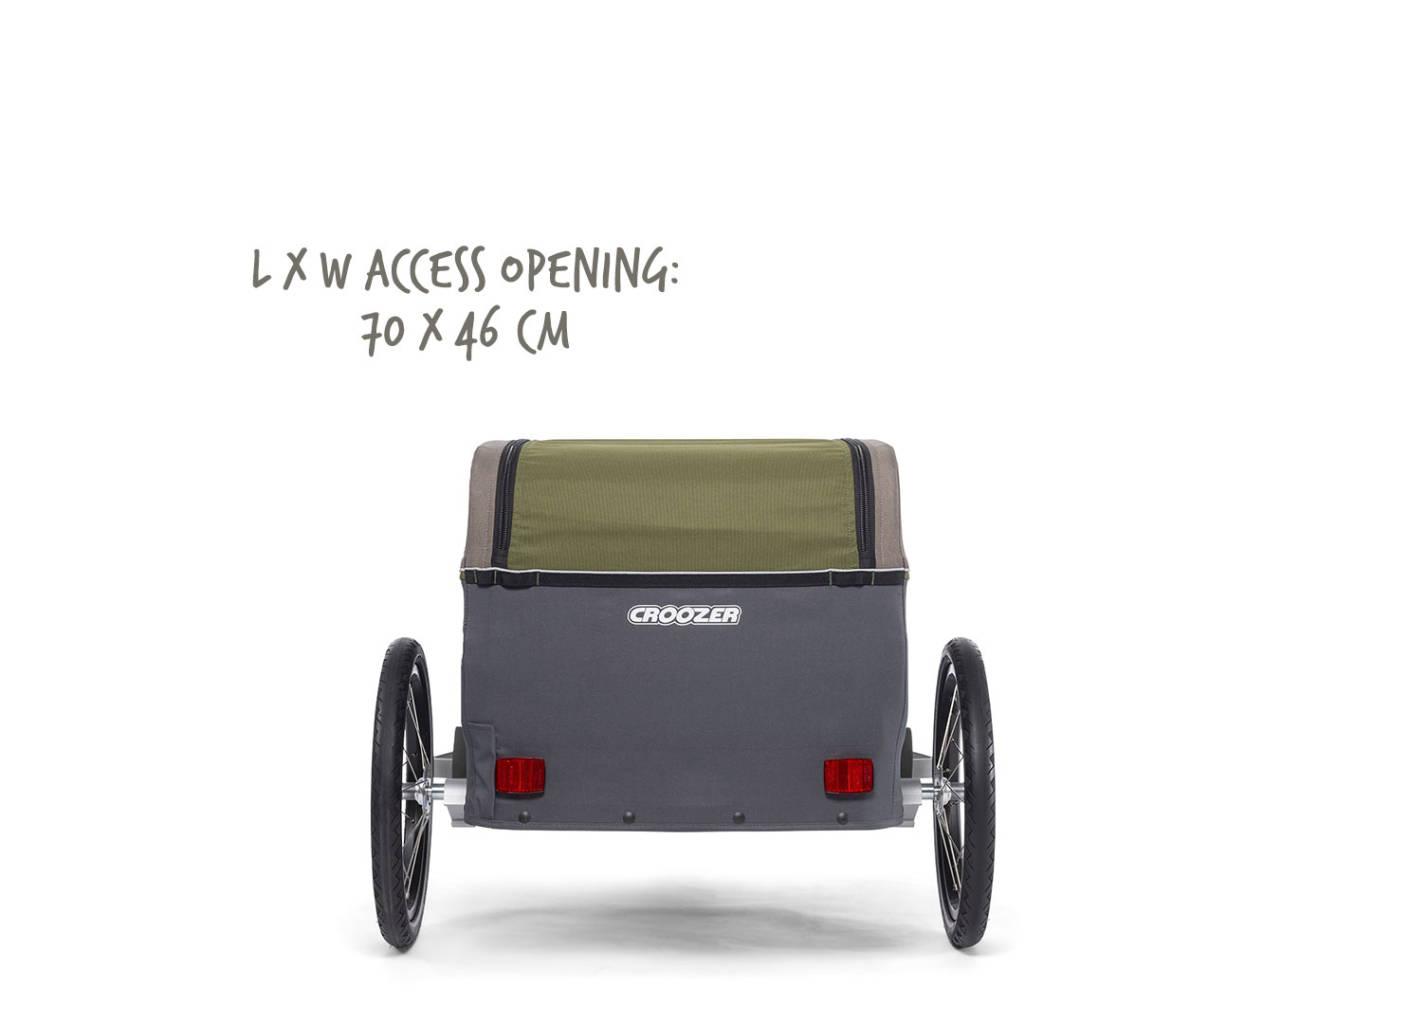 Tuure_access_opening_EN